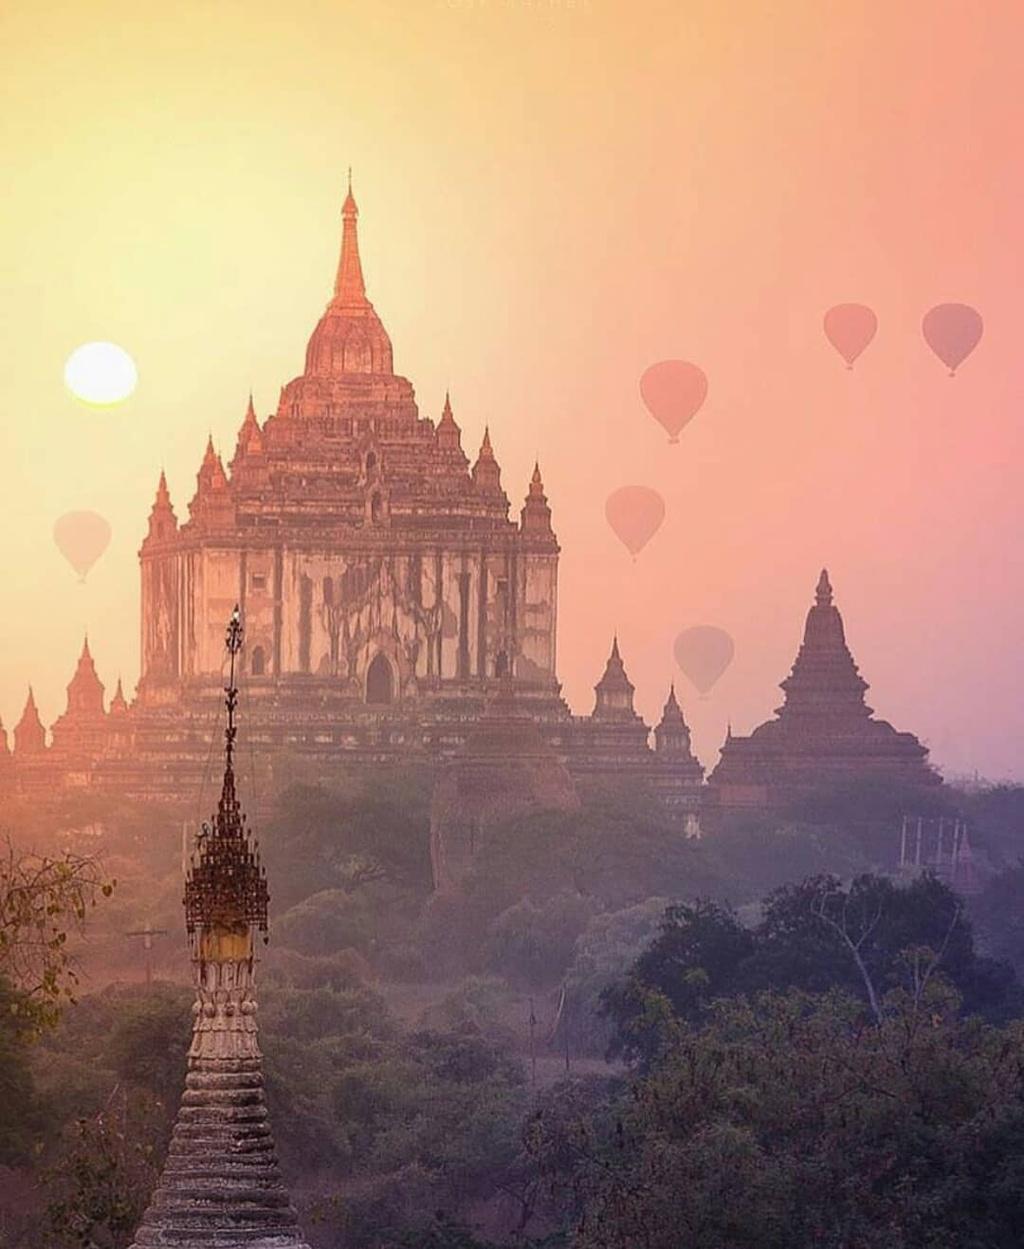 Ngam khinh khi cau tuyet dep o Myanmar hinh anh 1